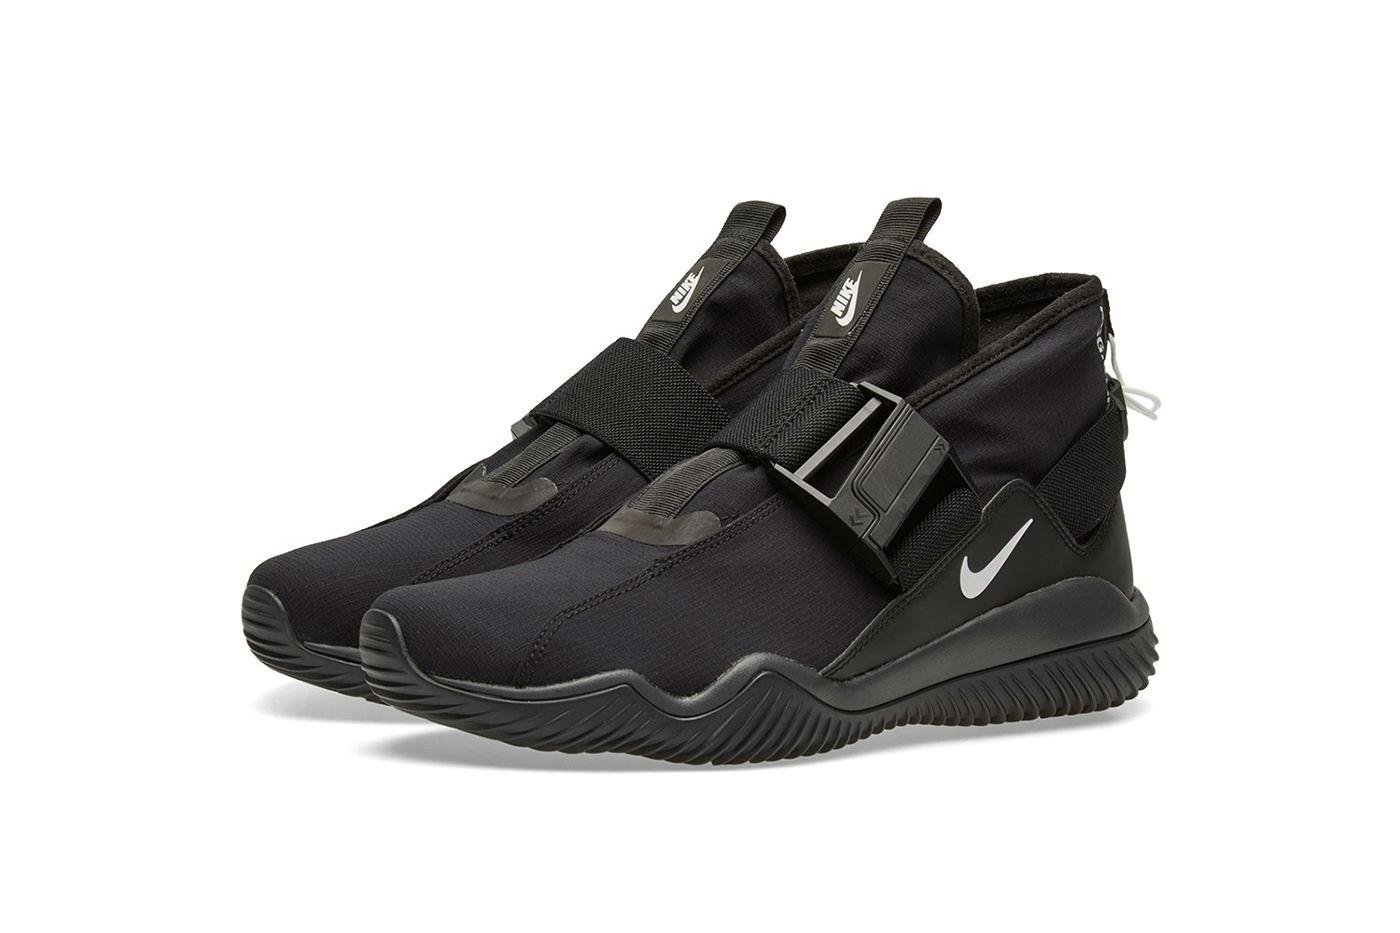 NikeLab ACG 07 Komyuter is Ready for